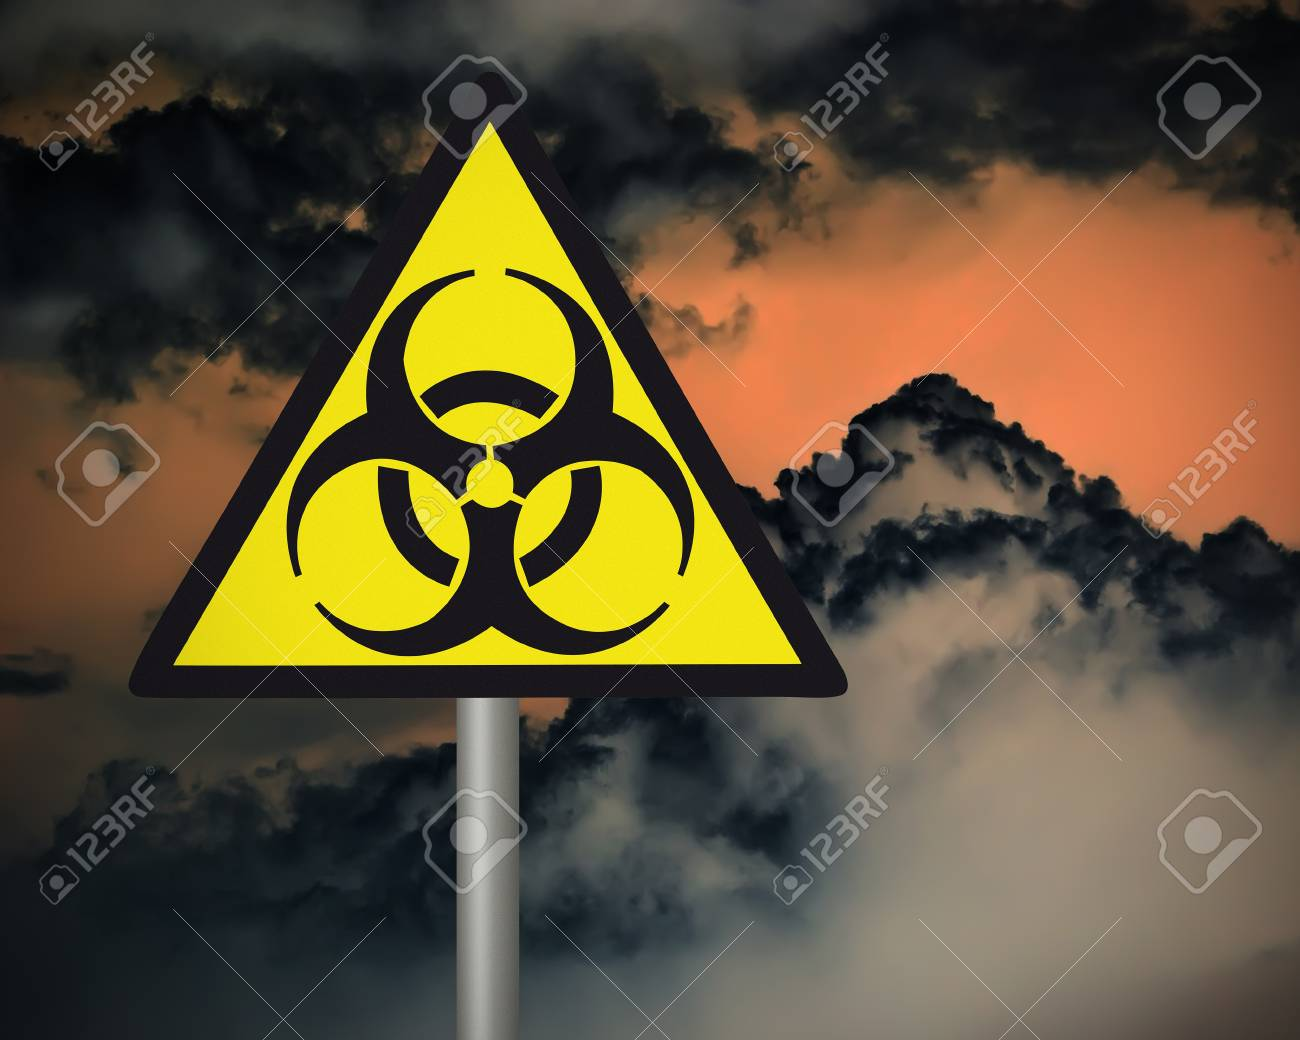 Yellow biohazard warning sign on against dark cloudy sky Stock Photo - 21384092